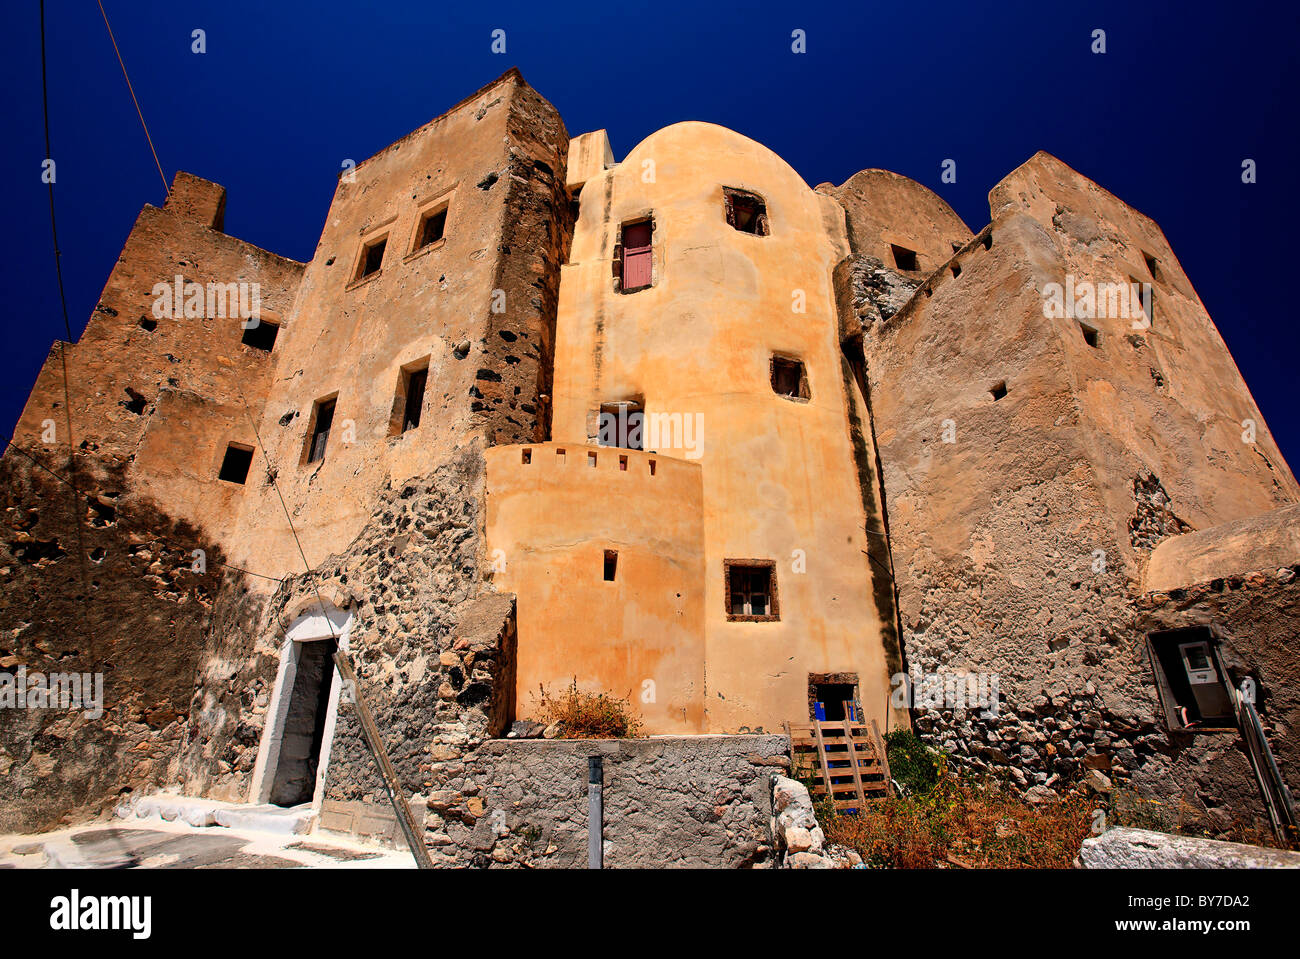 The Kastelli Small Castle Of Emboureios Village